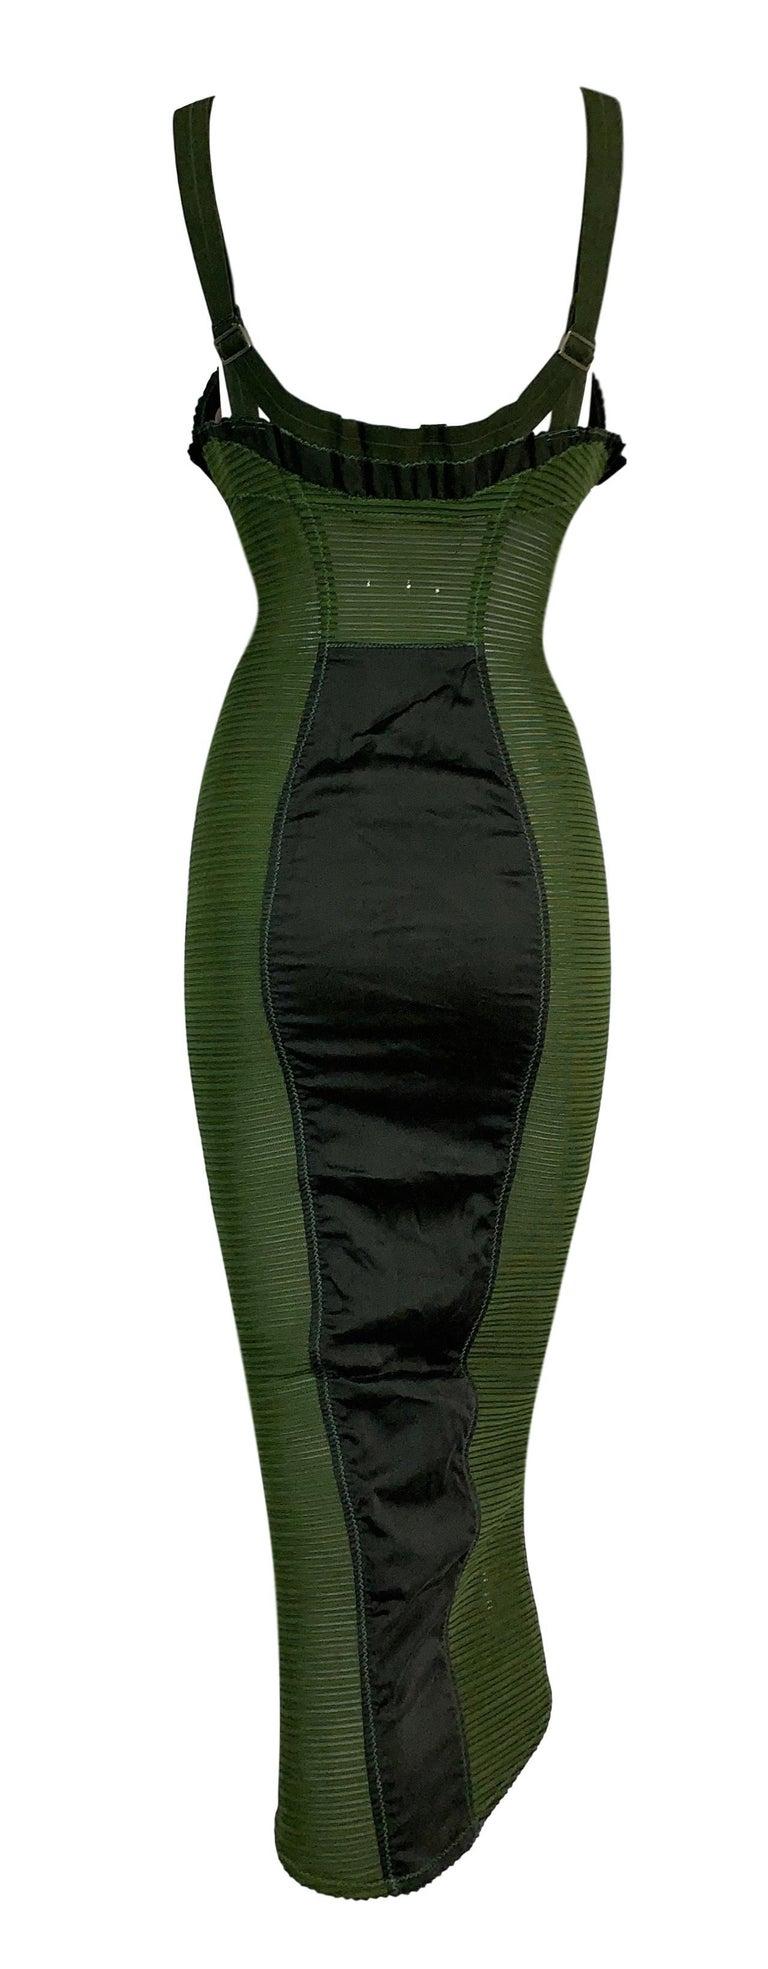 Vintage 1987 Jean Paul Gaultier Green Sheer Bandage Cone Bra Wiggle Dress In Good Condition In Yukon, OK